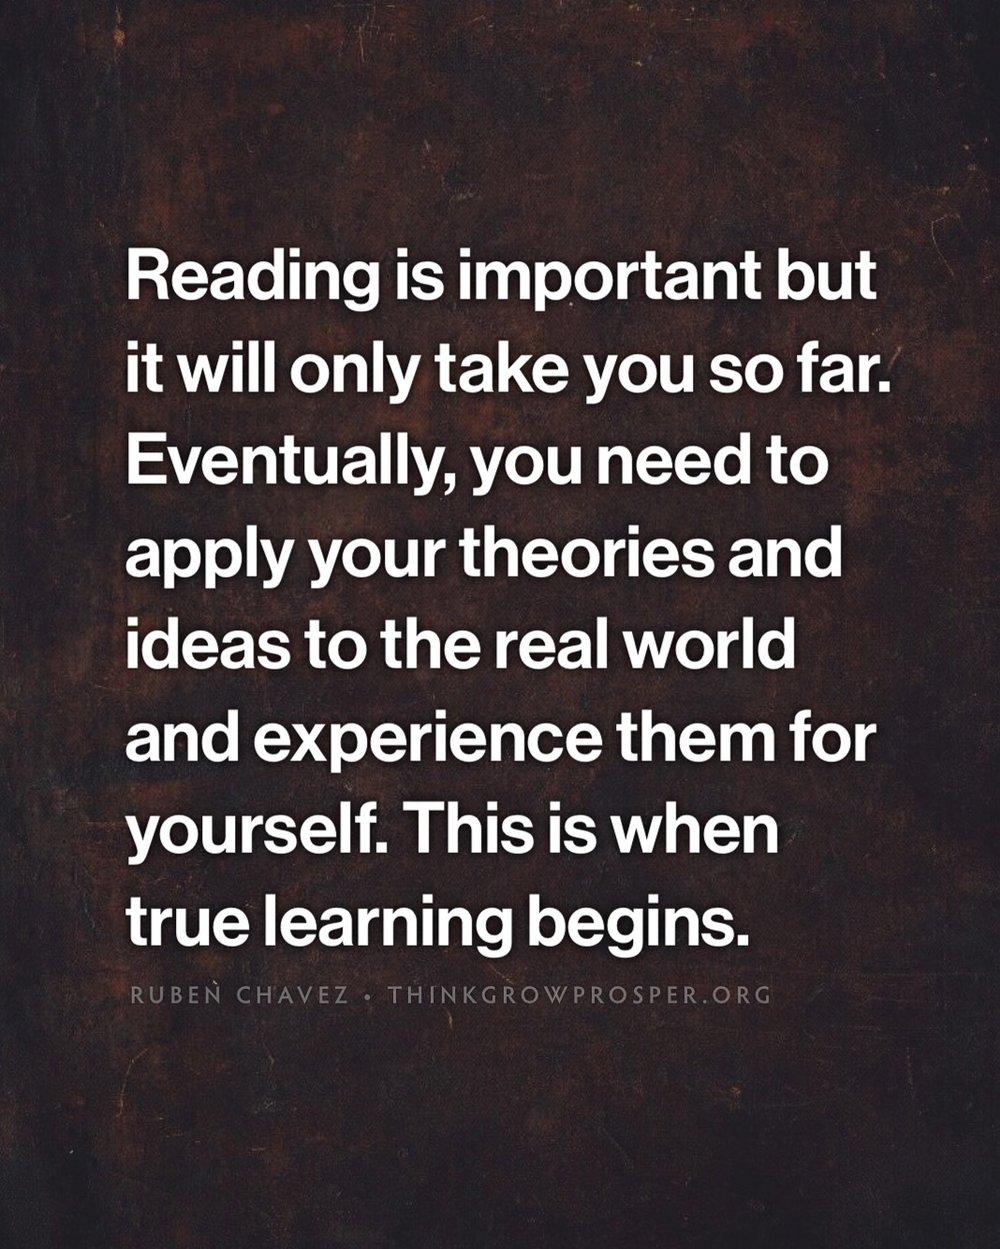 ReadingWillOnlyTakeYouSoFar.jpeg